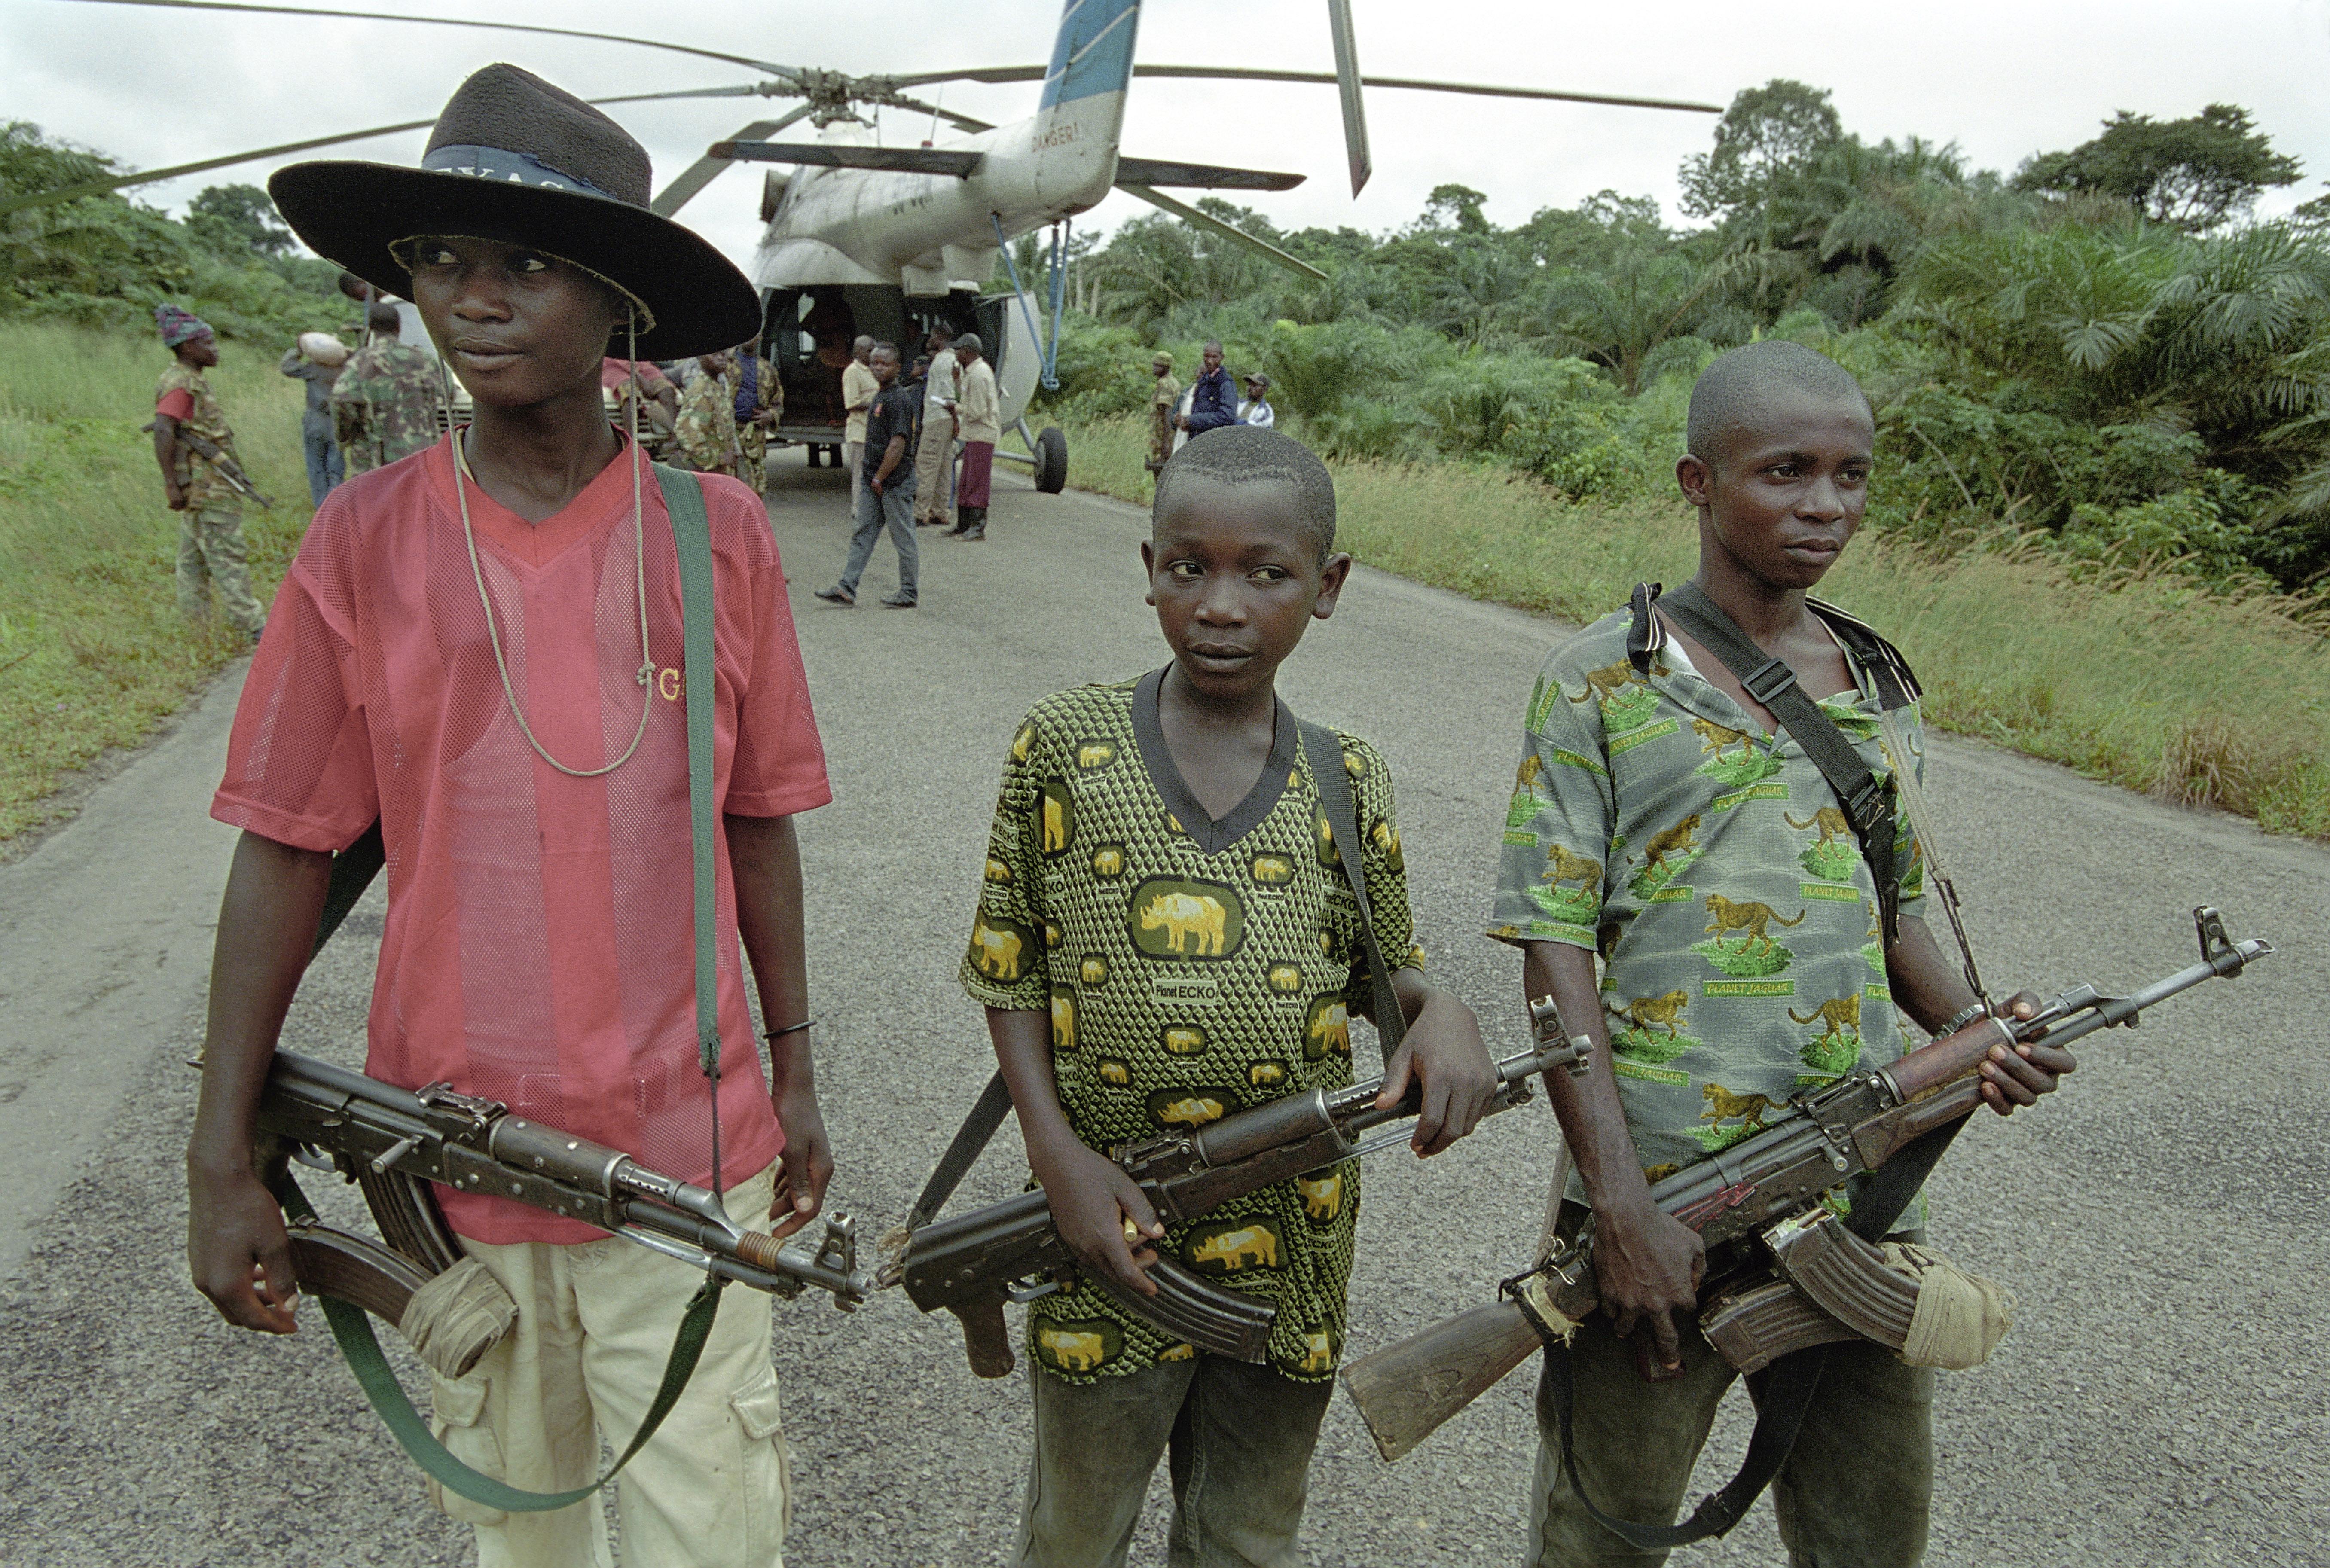 somalia krieg kindersoldaten